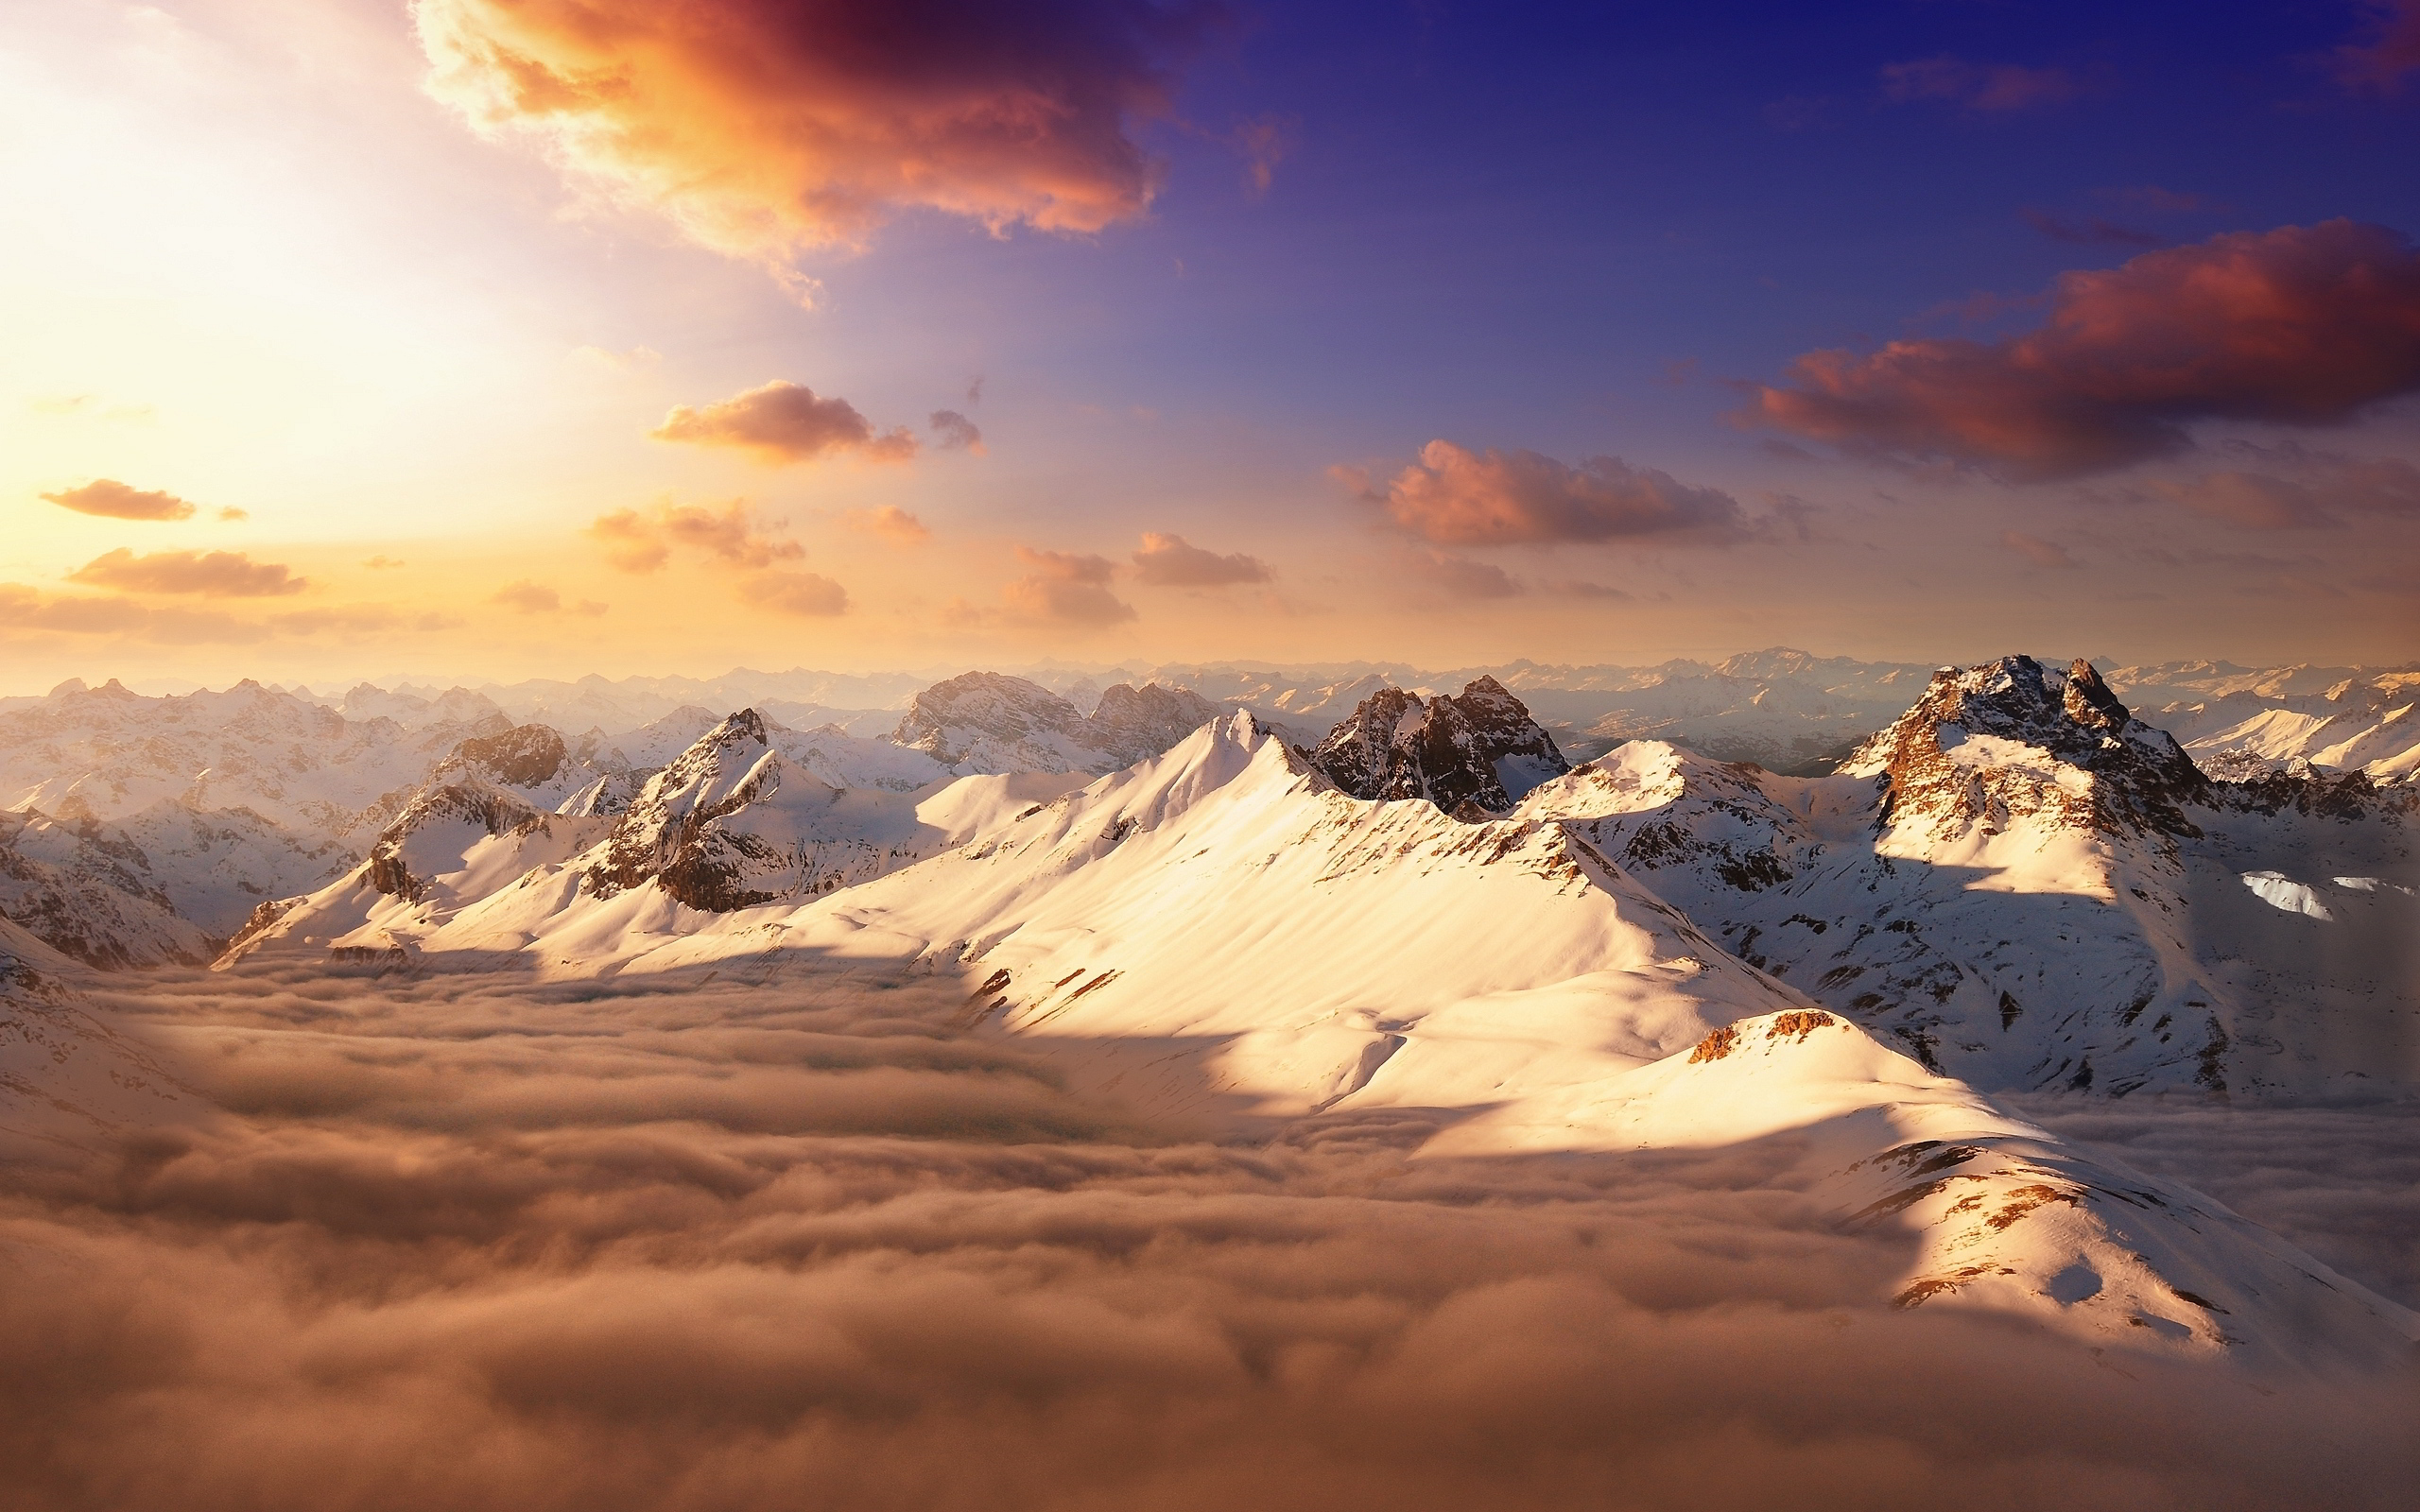 -mountain-sky-sunset-hd-wallpaper-10658 - Wall Paper